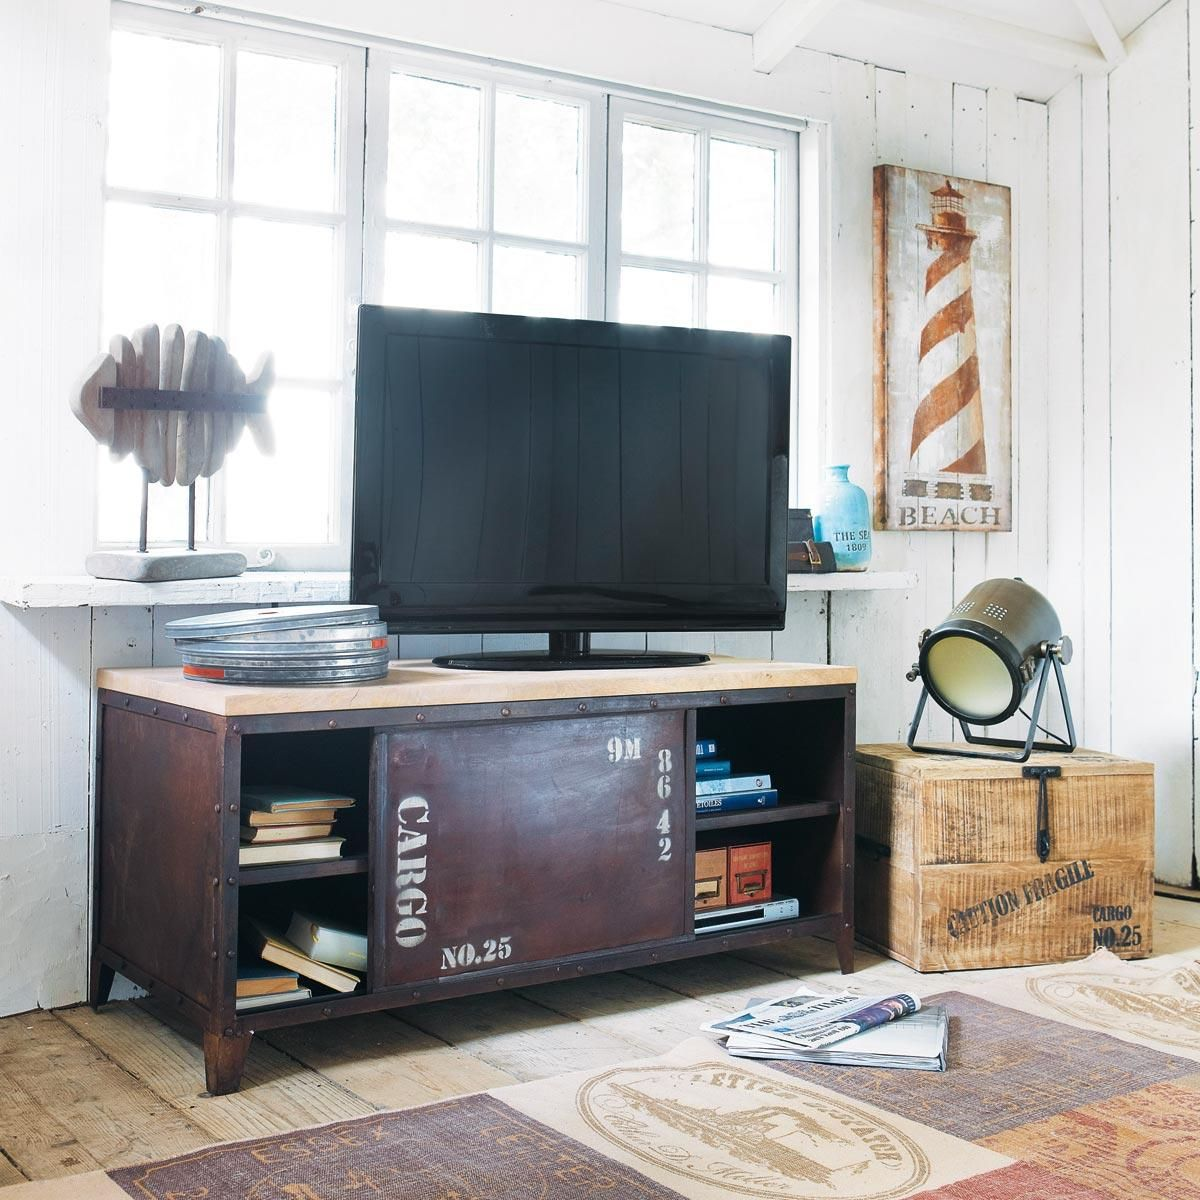 pesce decorativo lanester maisons du monde pinterest tela and tv stands. Black Bedroom Furniture Sets. Home Design Ideas